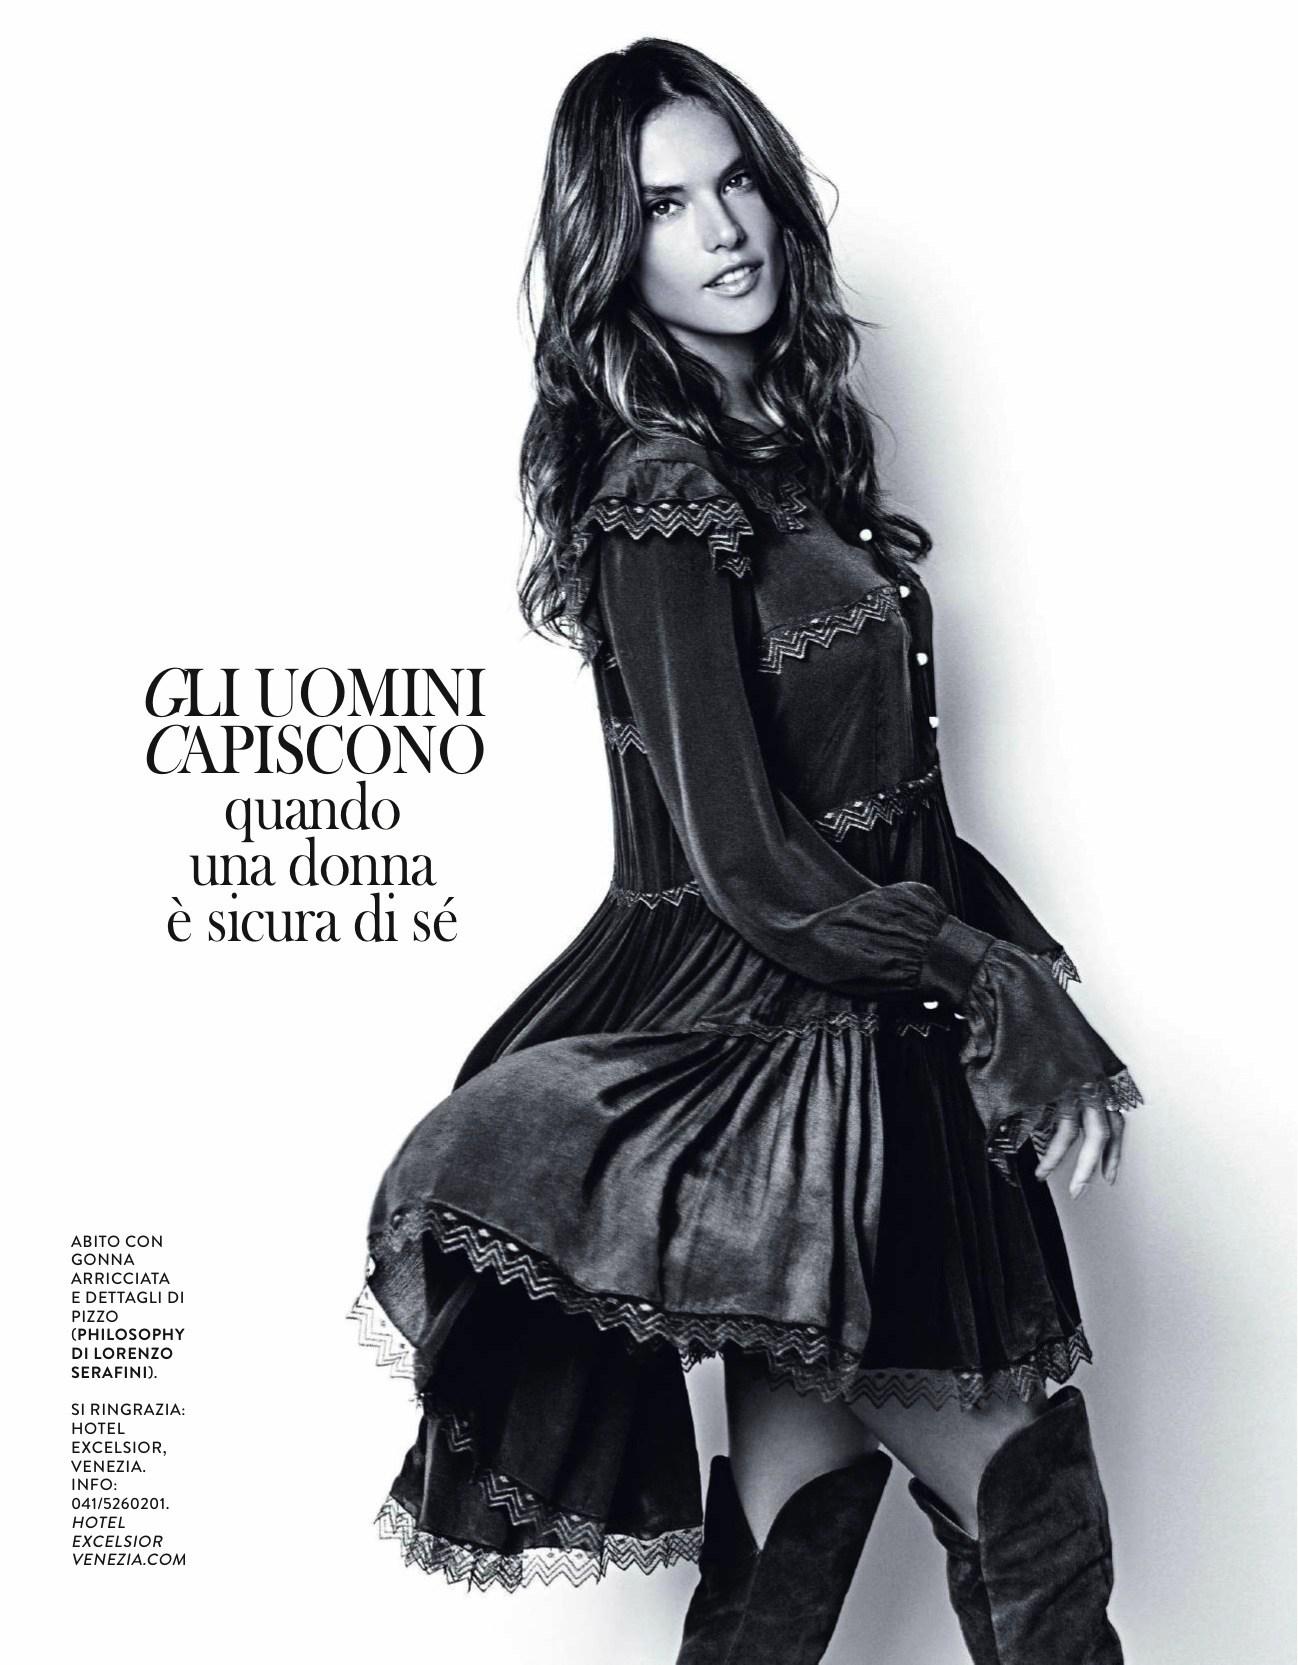 17.11.2015 - Grazia - Alessandra Ambrosio - Photo Julian Hargreaves - Style Ildo Damiano - Hair Massimo Serini